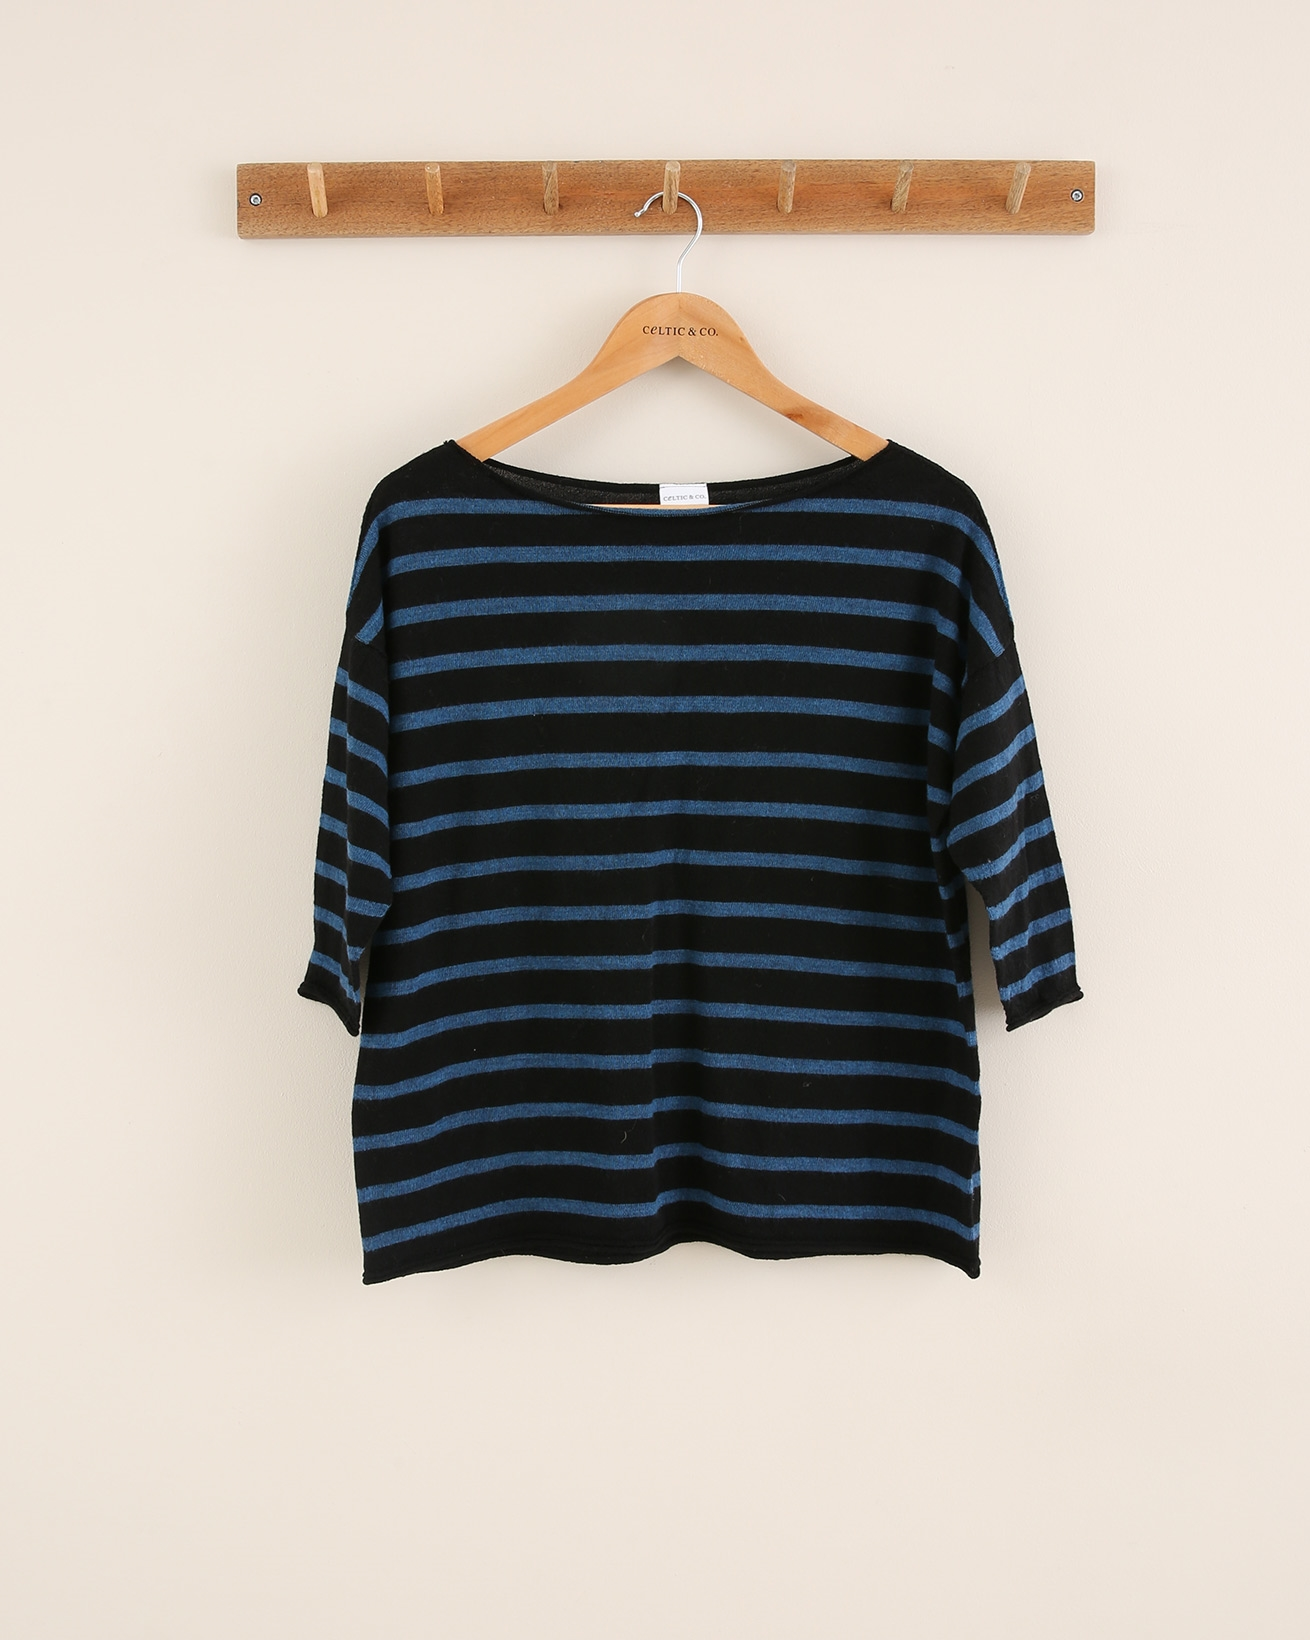 Fine Knit Merino Short Sleeve Crew Neck - Size Small - Black Stripe - 1794